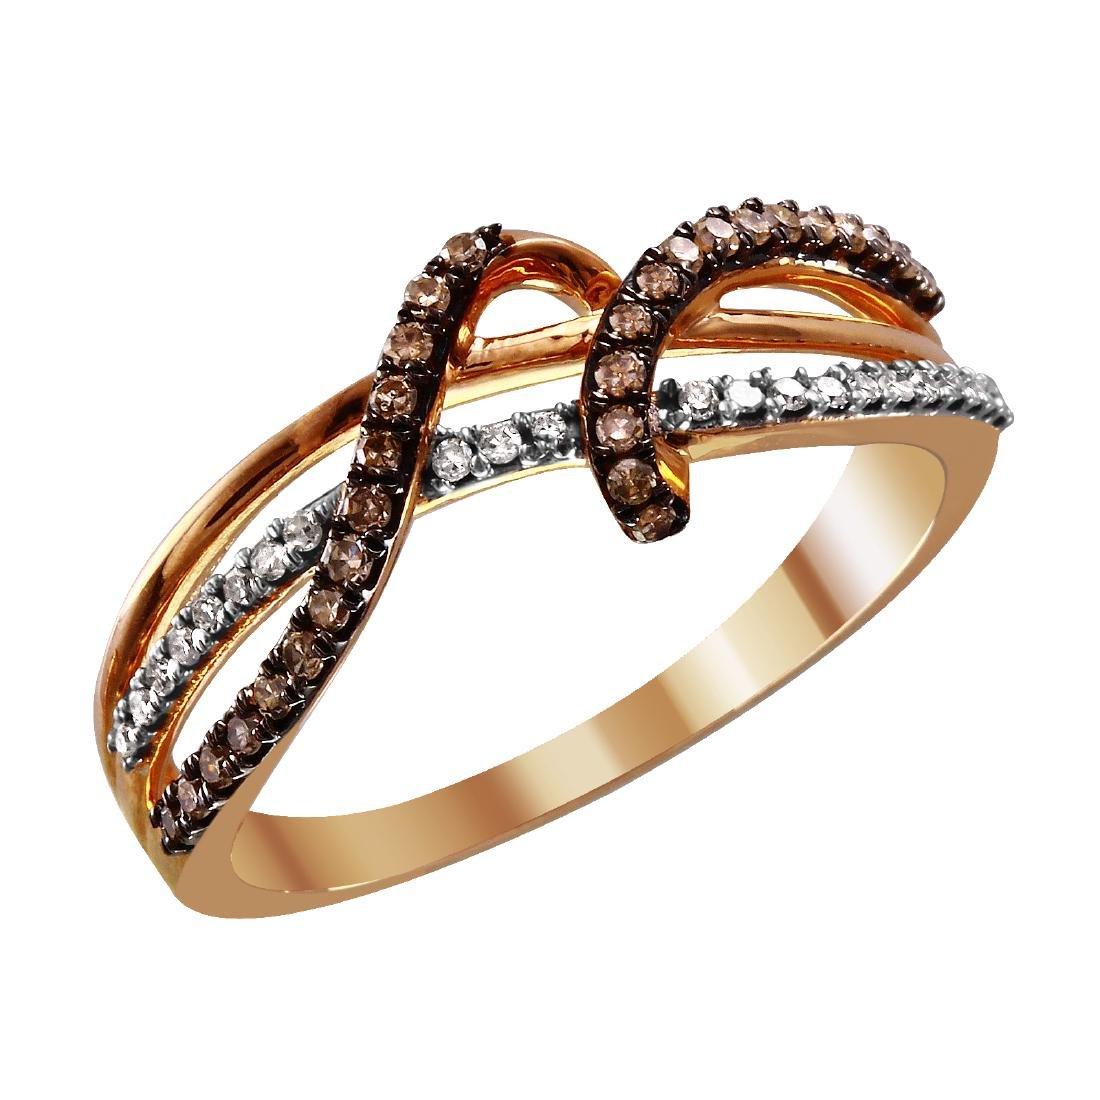 10KT Gold Diamond Ring